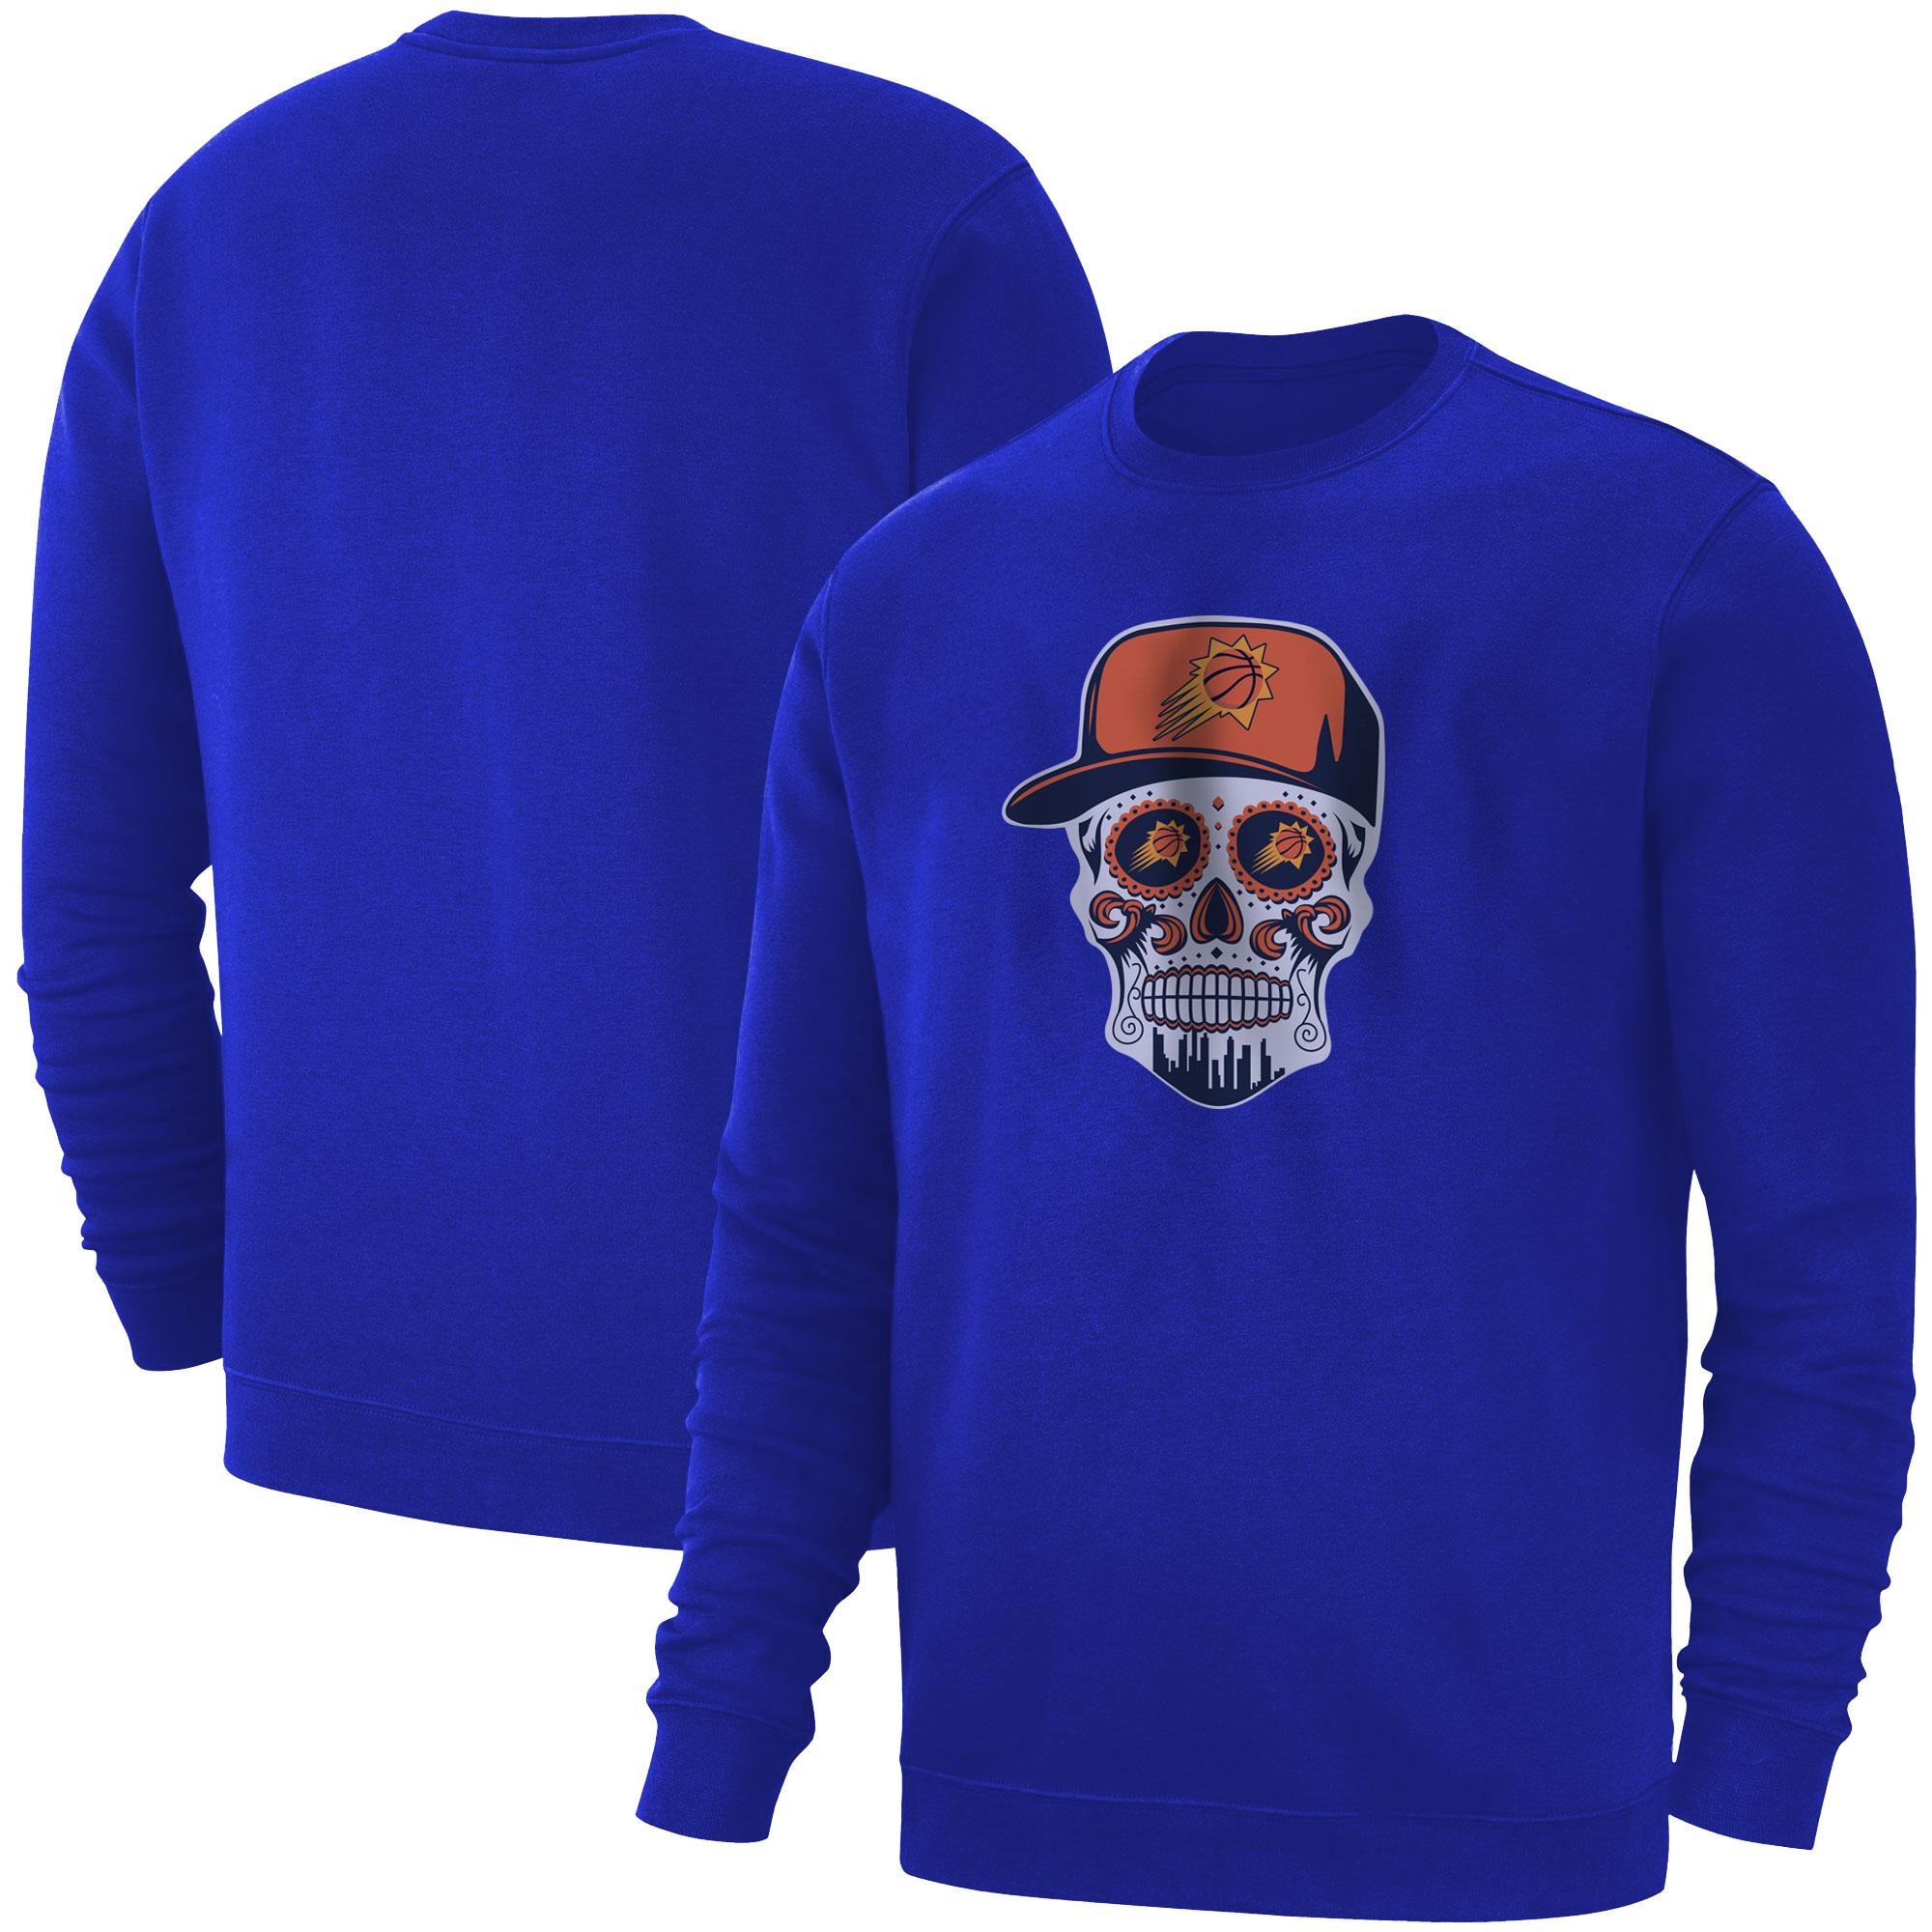 Phoenix Skull Basic (BSC-BLU-NP-461-NBA-PHO-SKULL)